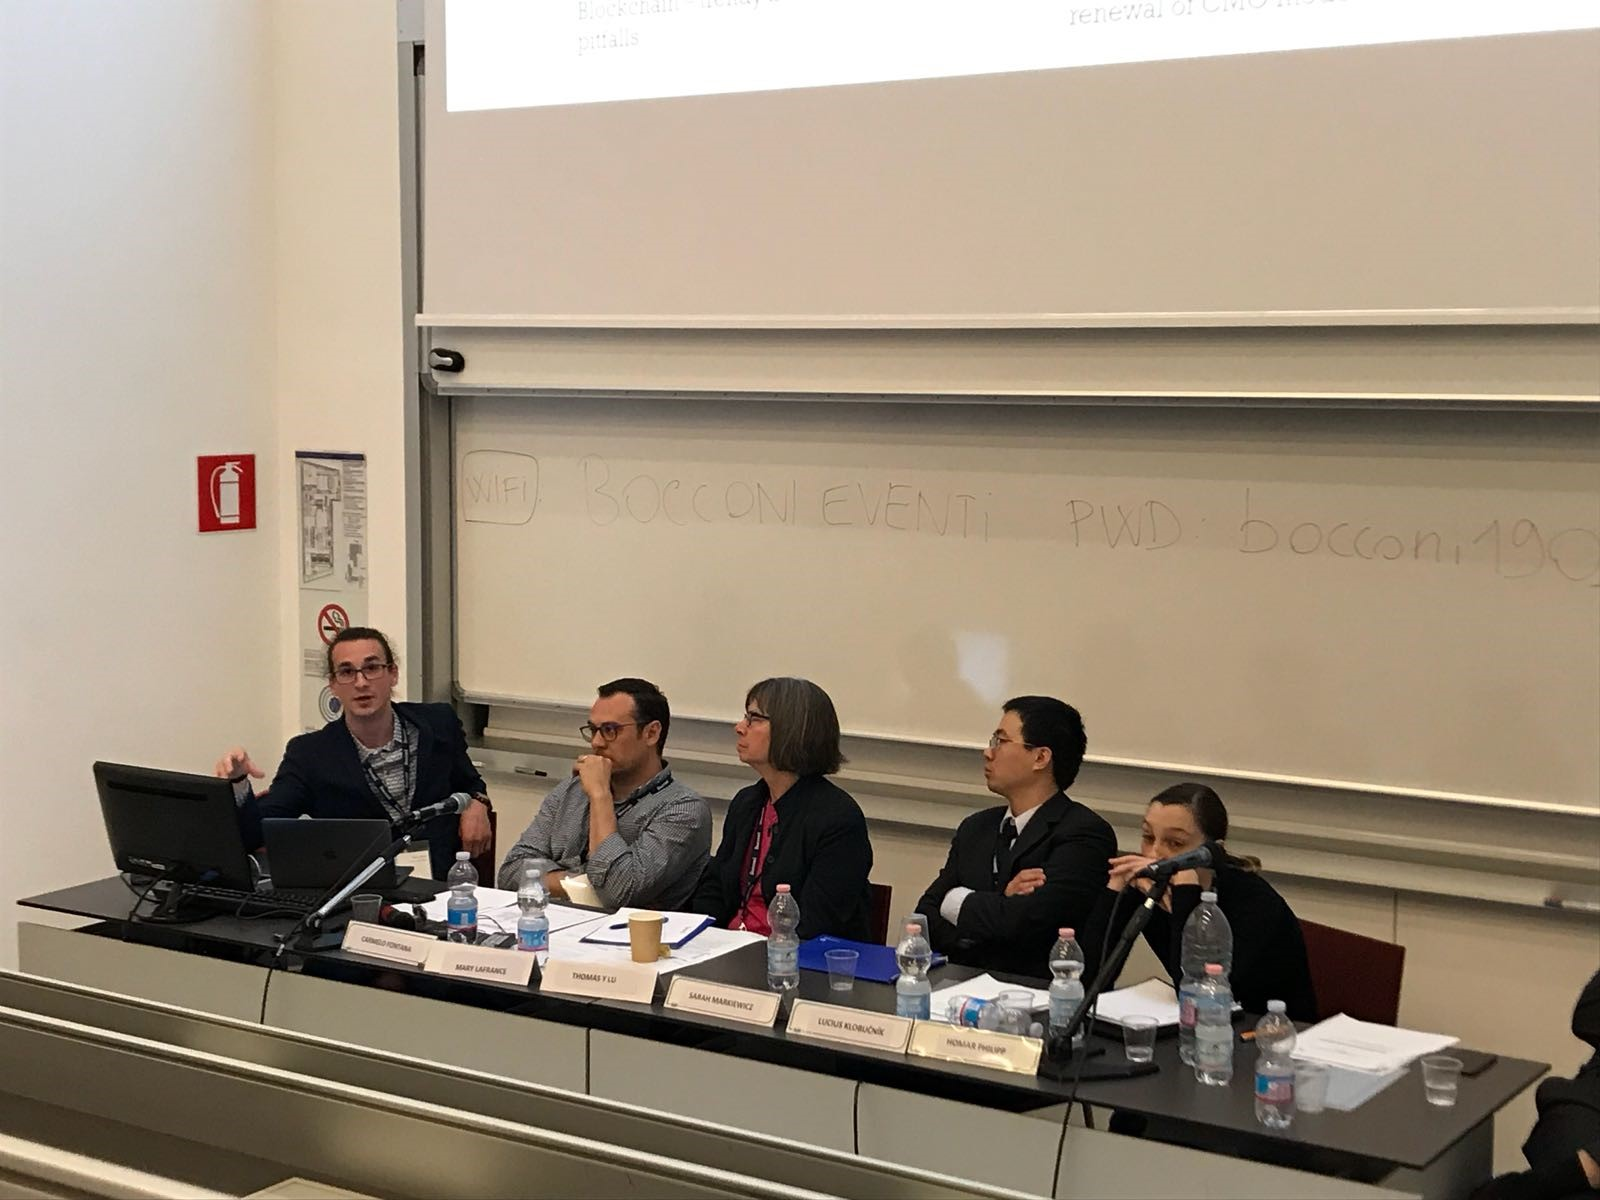 Presentation by Lucius Klobučník in Milan